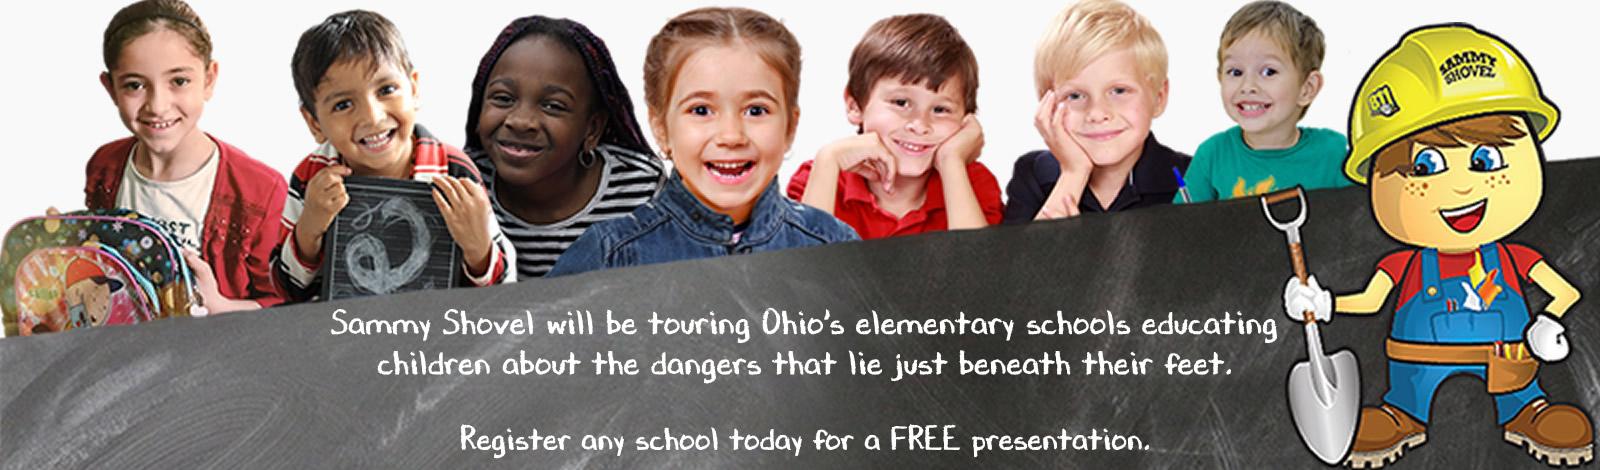 Let Sammy Shovel come visit your school